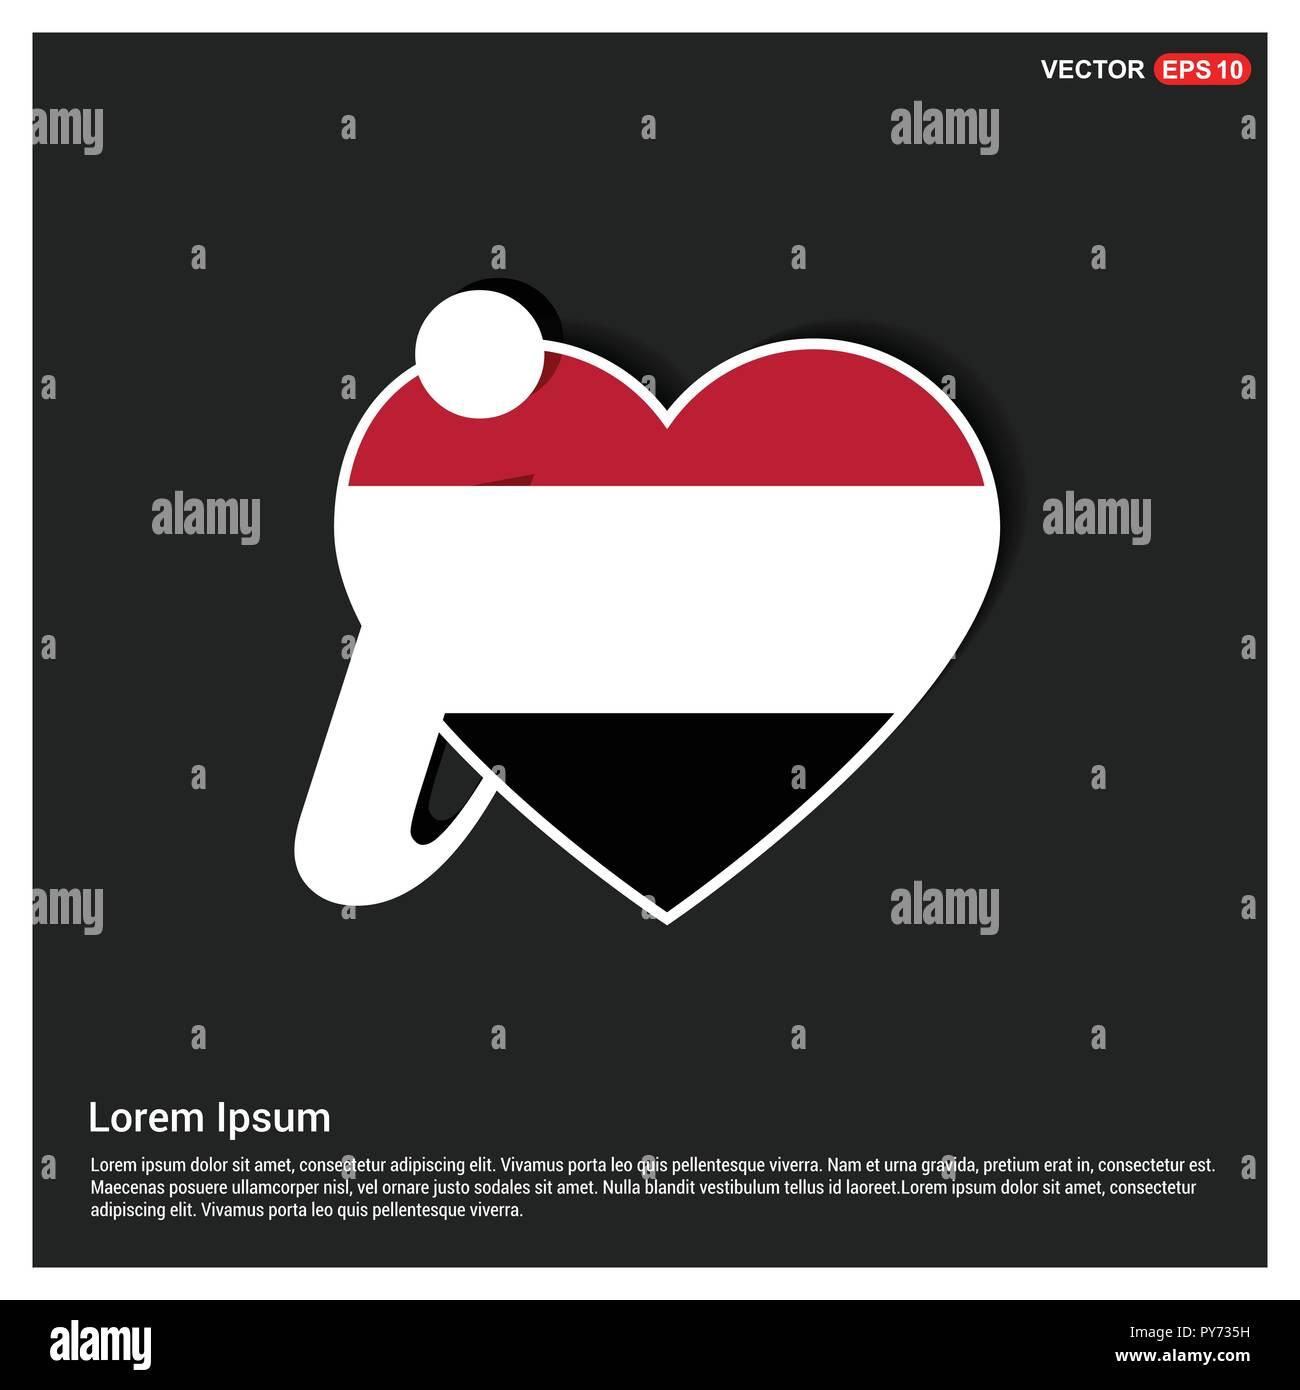 Yemen flag design vector - Stock Image